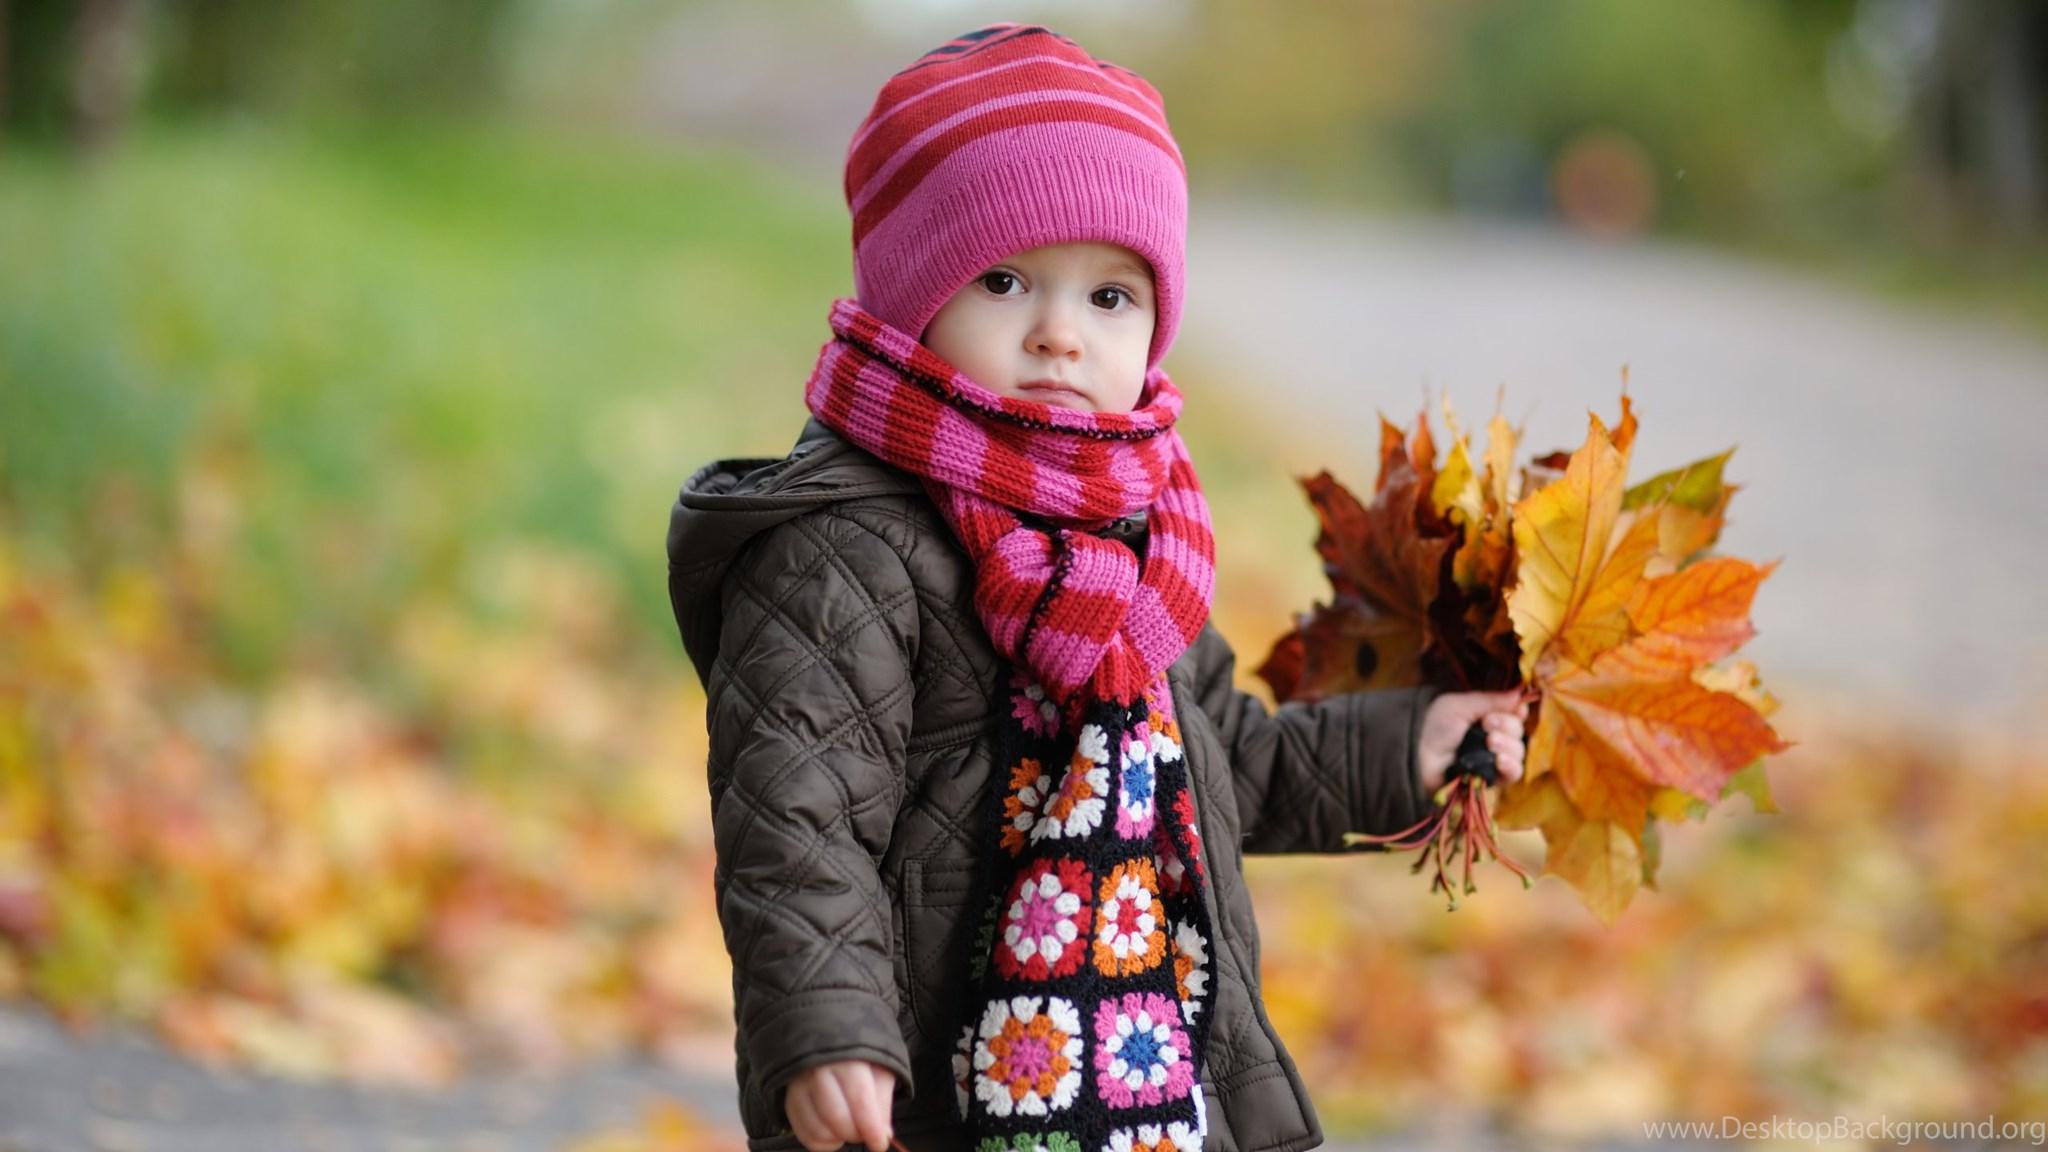 Cute Baby Wallpapers – Windows 10 Wallpapers Desktop Background